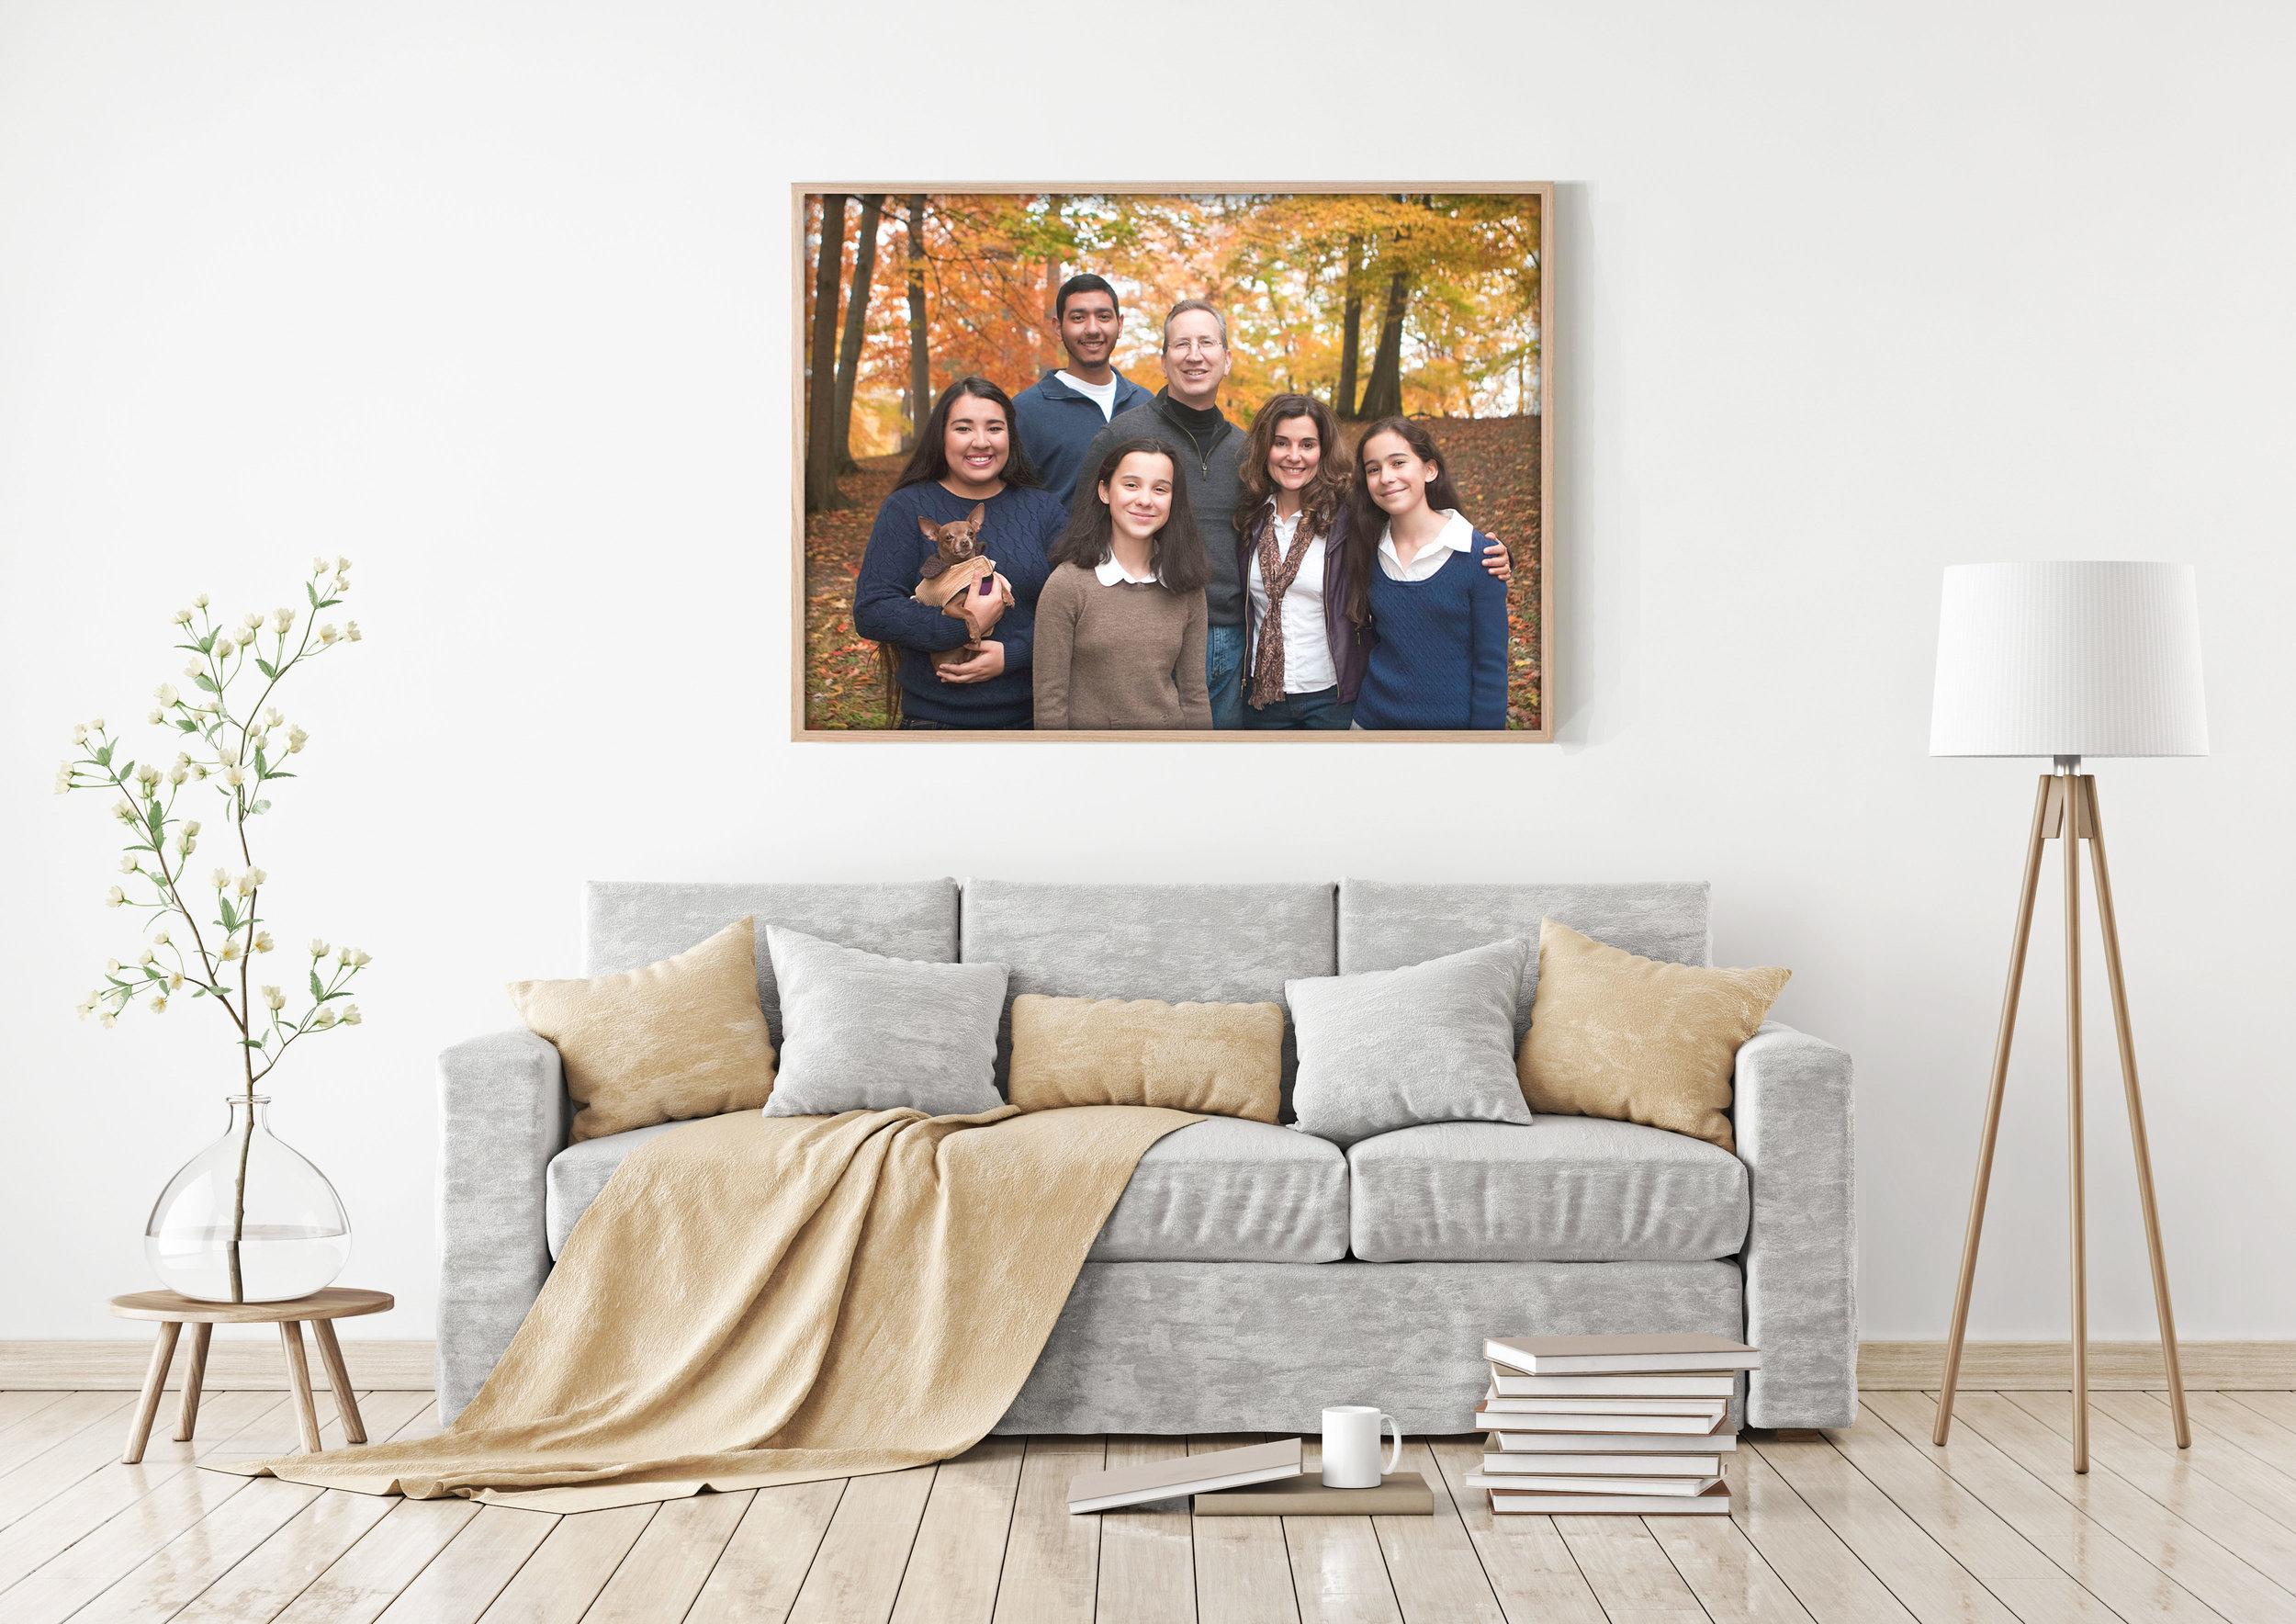 lansingmichiganfamilyphotographers.jpg